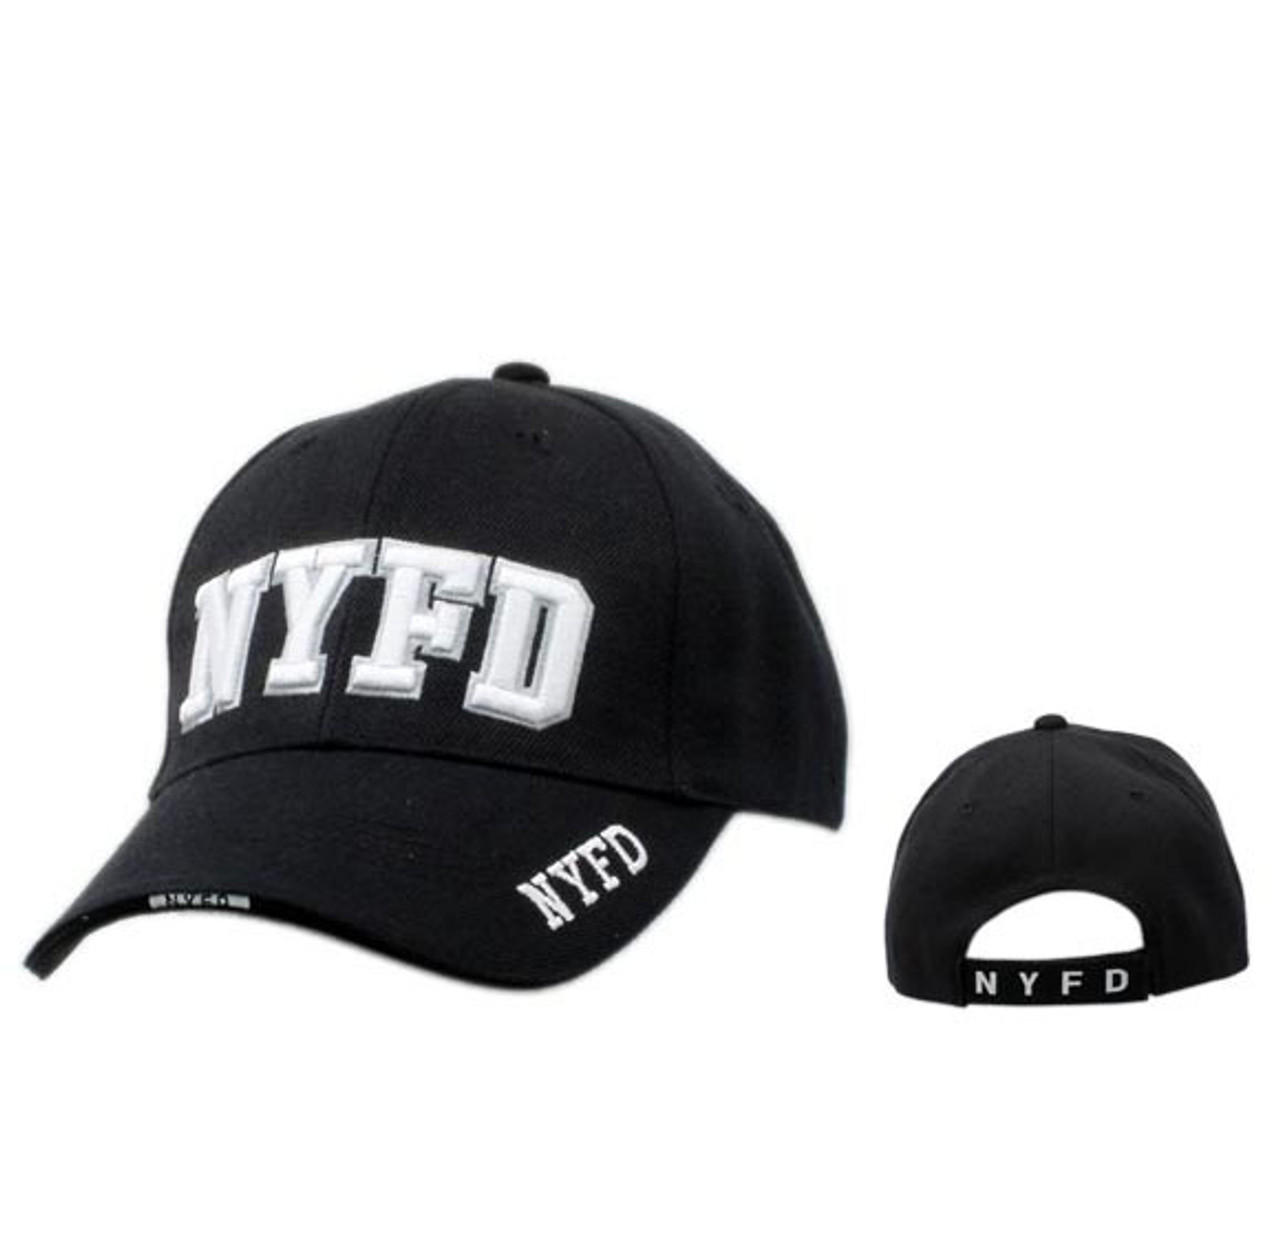 NYFD Wholesale Black Baseball Cap